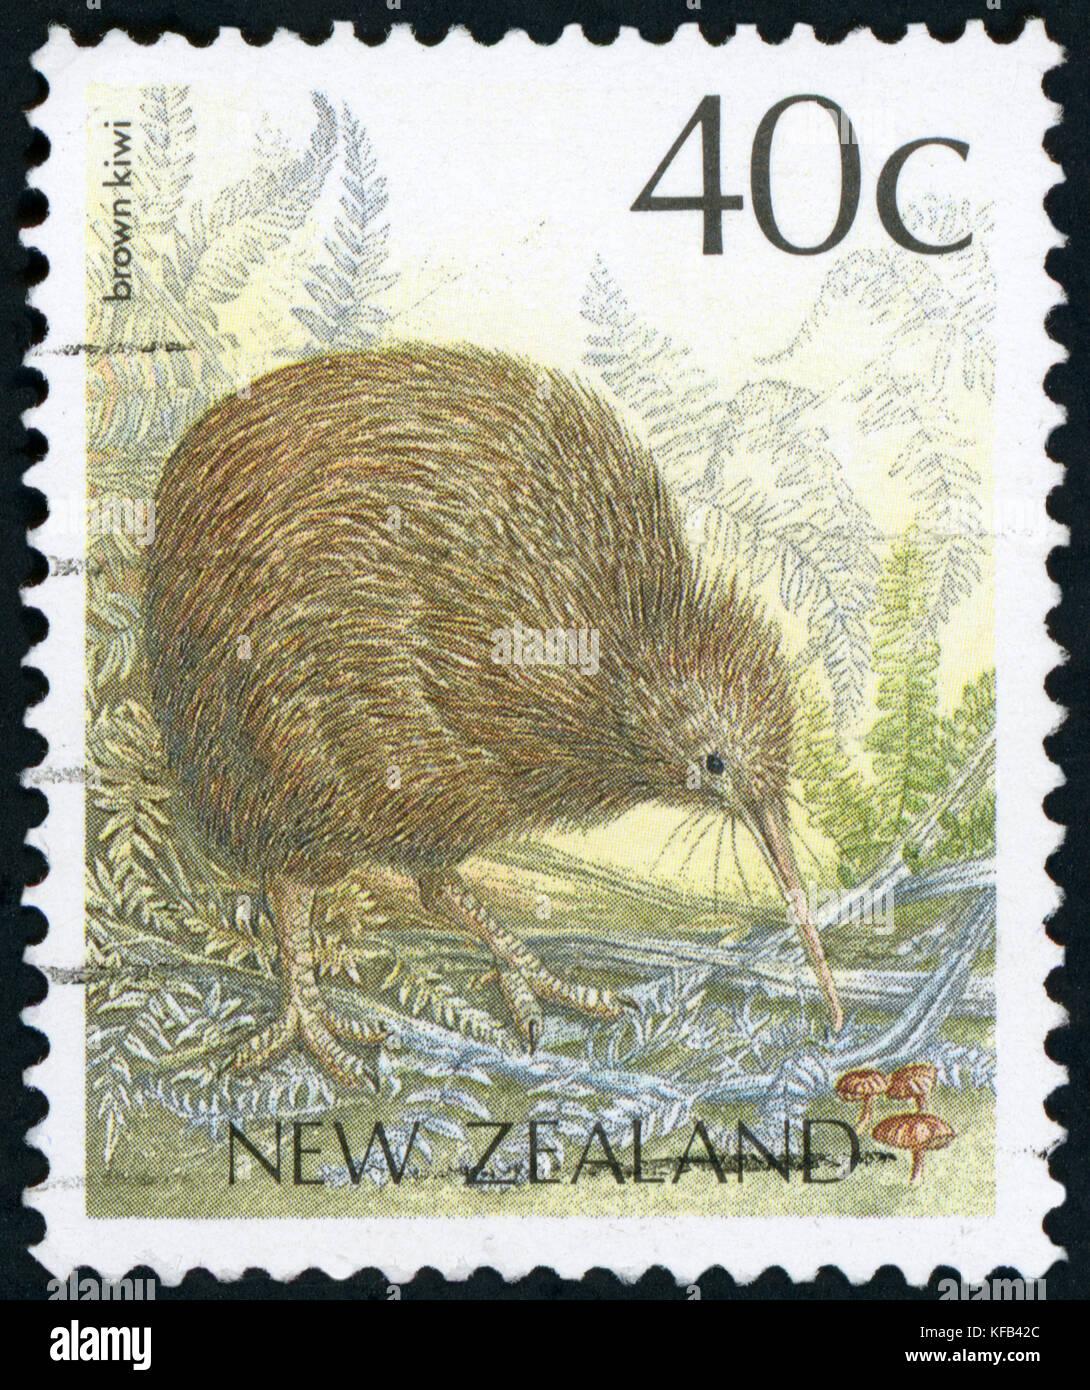 Postage stamp (New Zealand - Brown Kiwi) - Stock Image